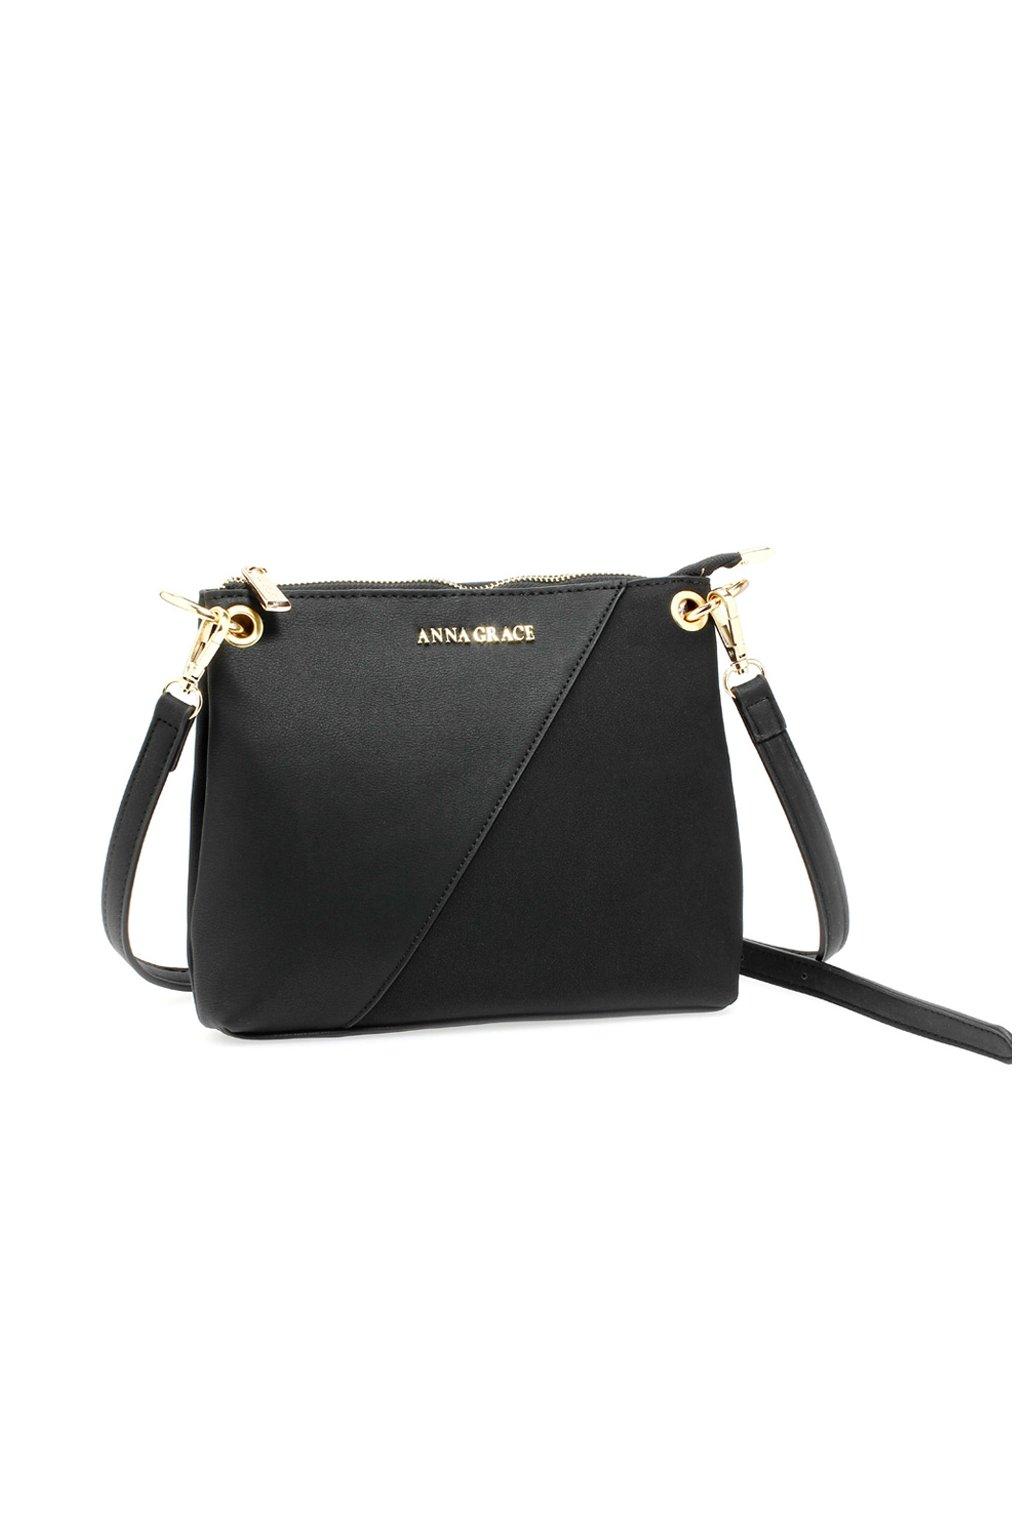 Crossbody kabelka čierna Evie AG00616